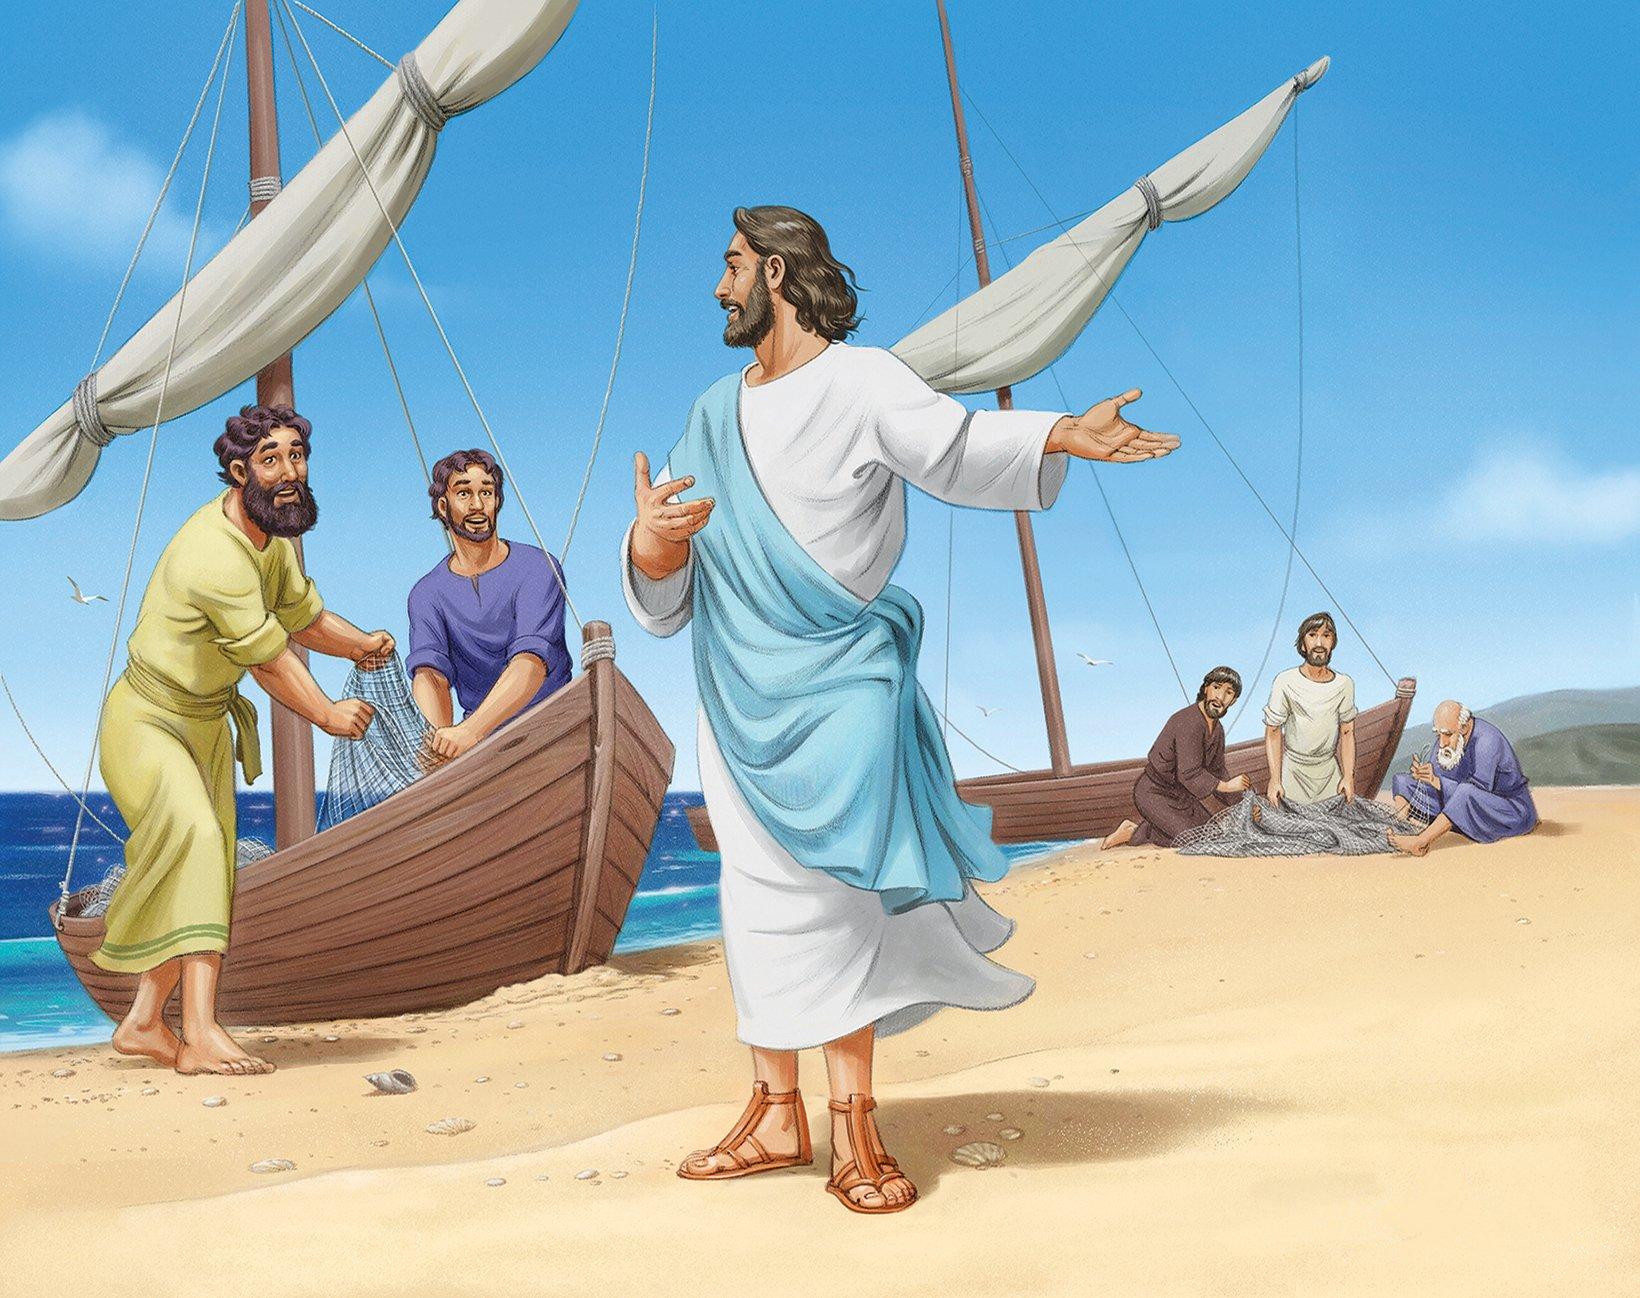 Bible Lesson 3 - Jesus the Savior is Born